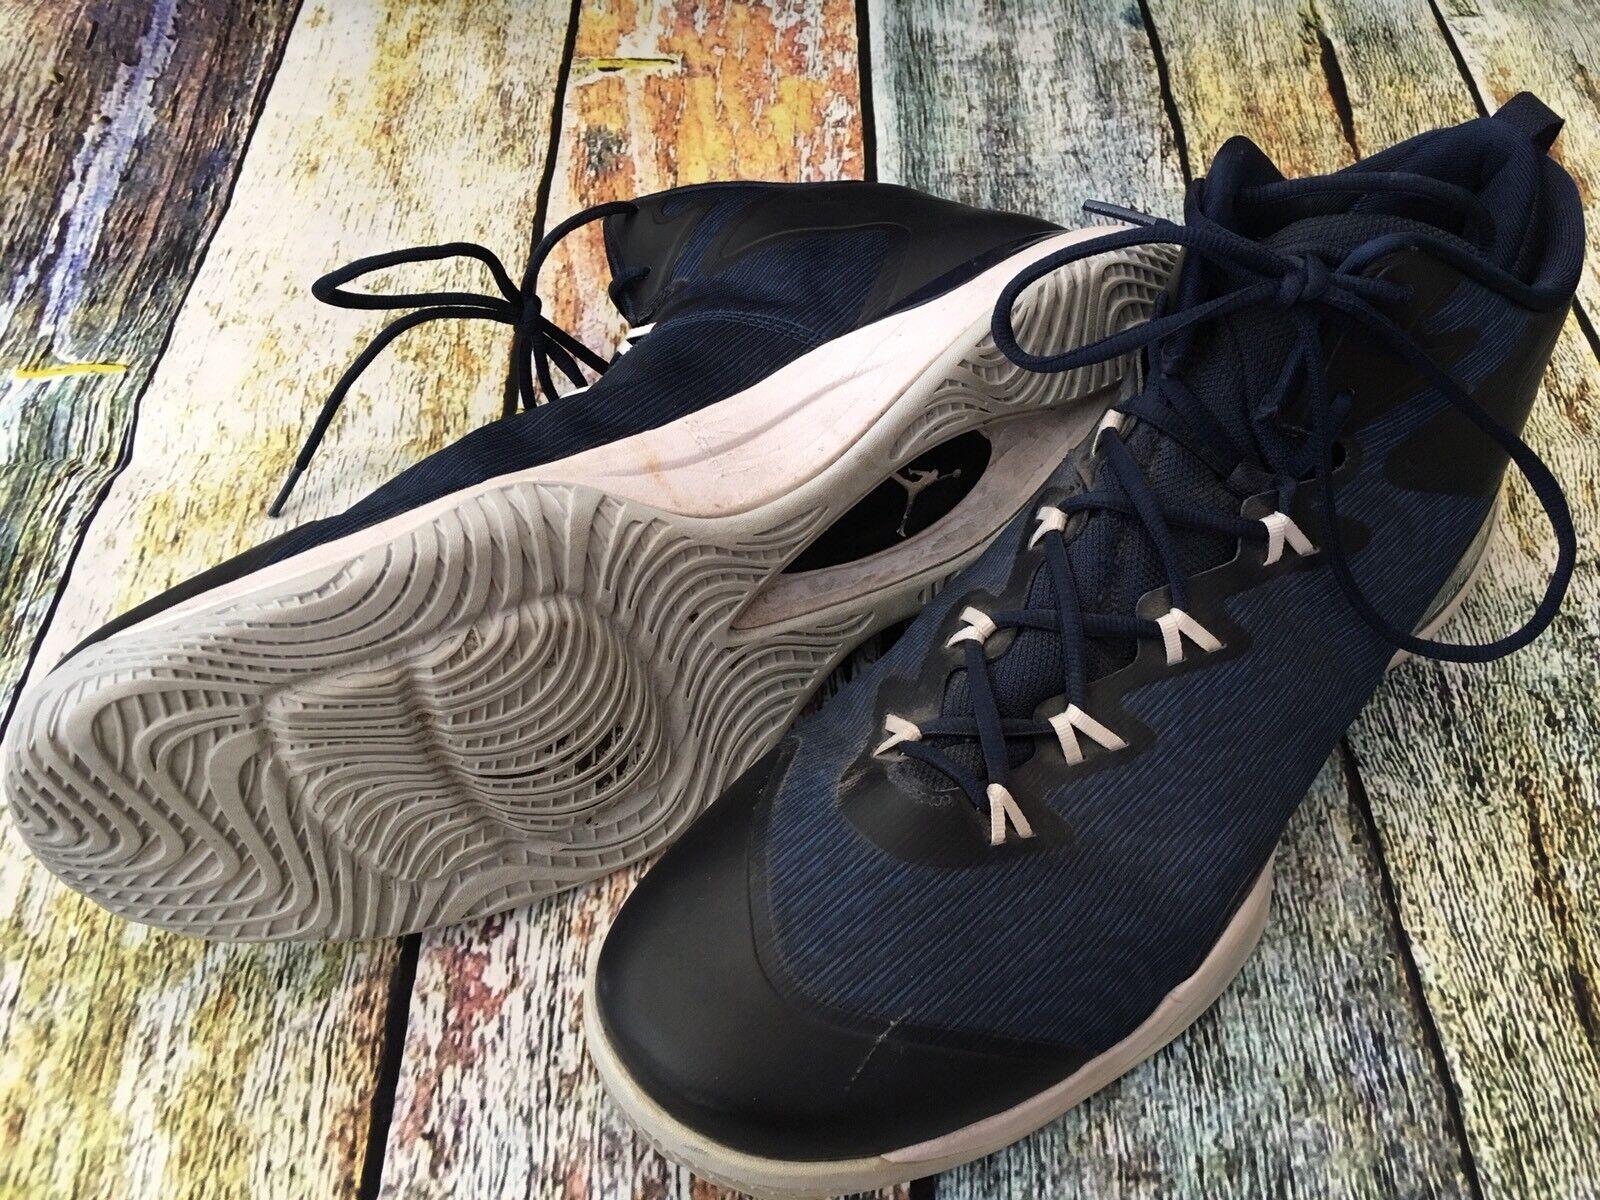 Nike Air jordan flight baloncesto Plate hombres zapatos de baloncesto flight de tamaño 18 nosotros 52,5 EU BLK / azul 15ed6c